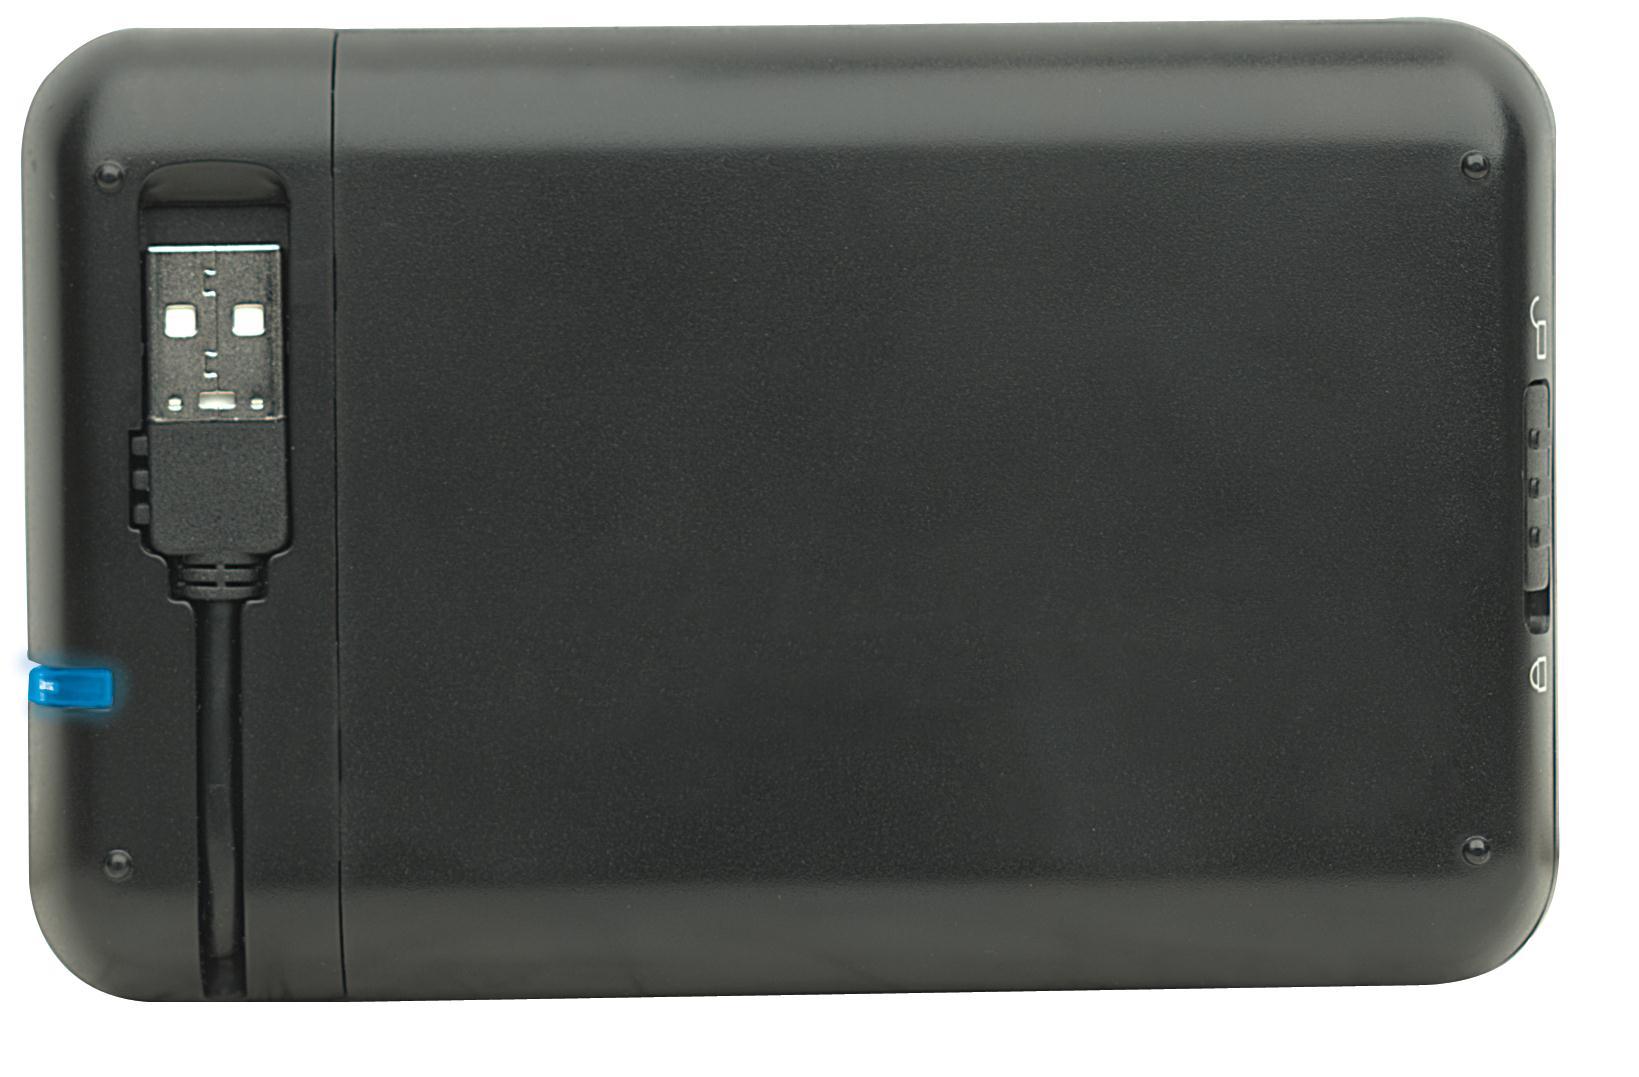 Manhattan Drive Enclosure 2.5 inch USB 2.0 (Black)